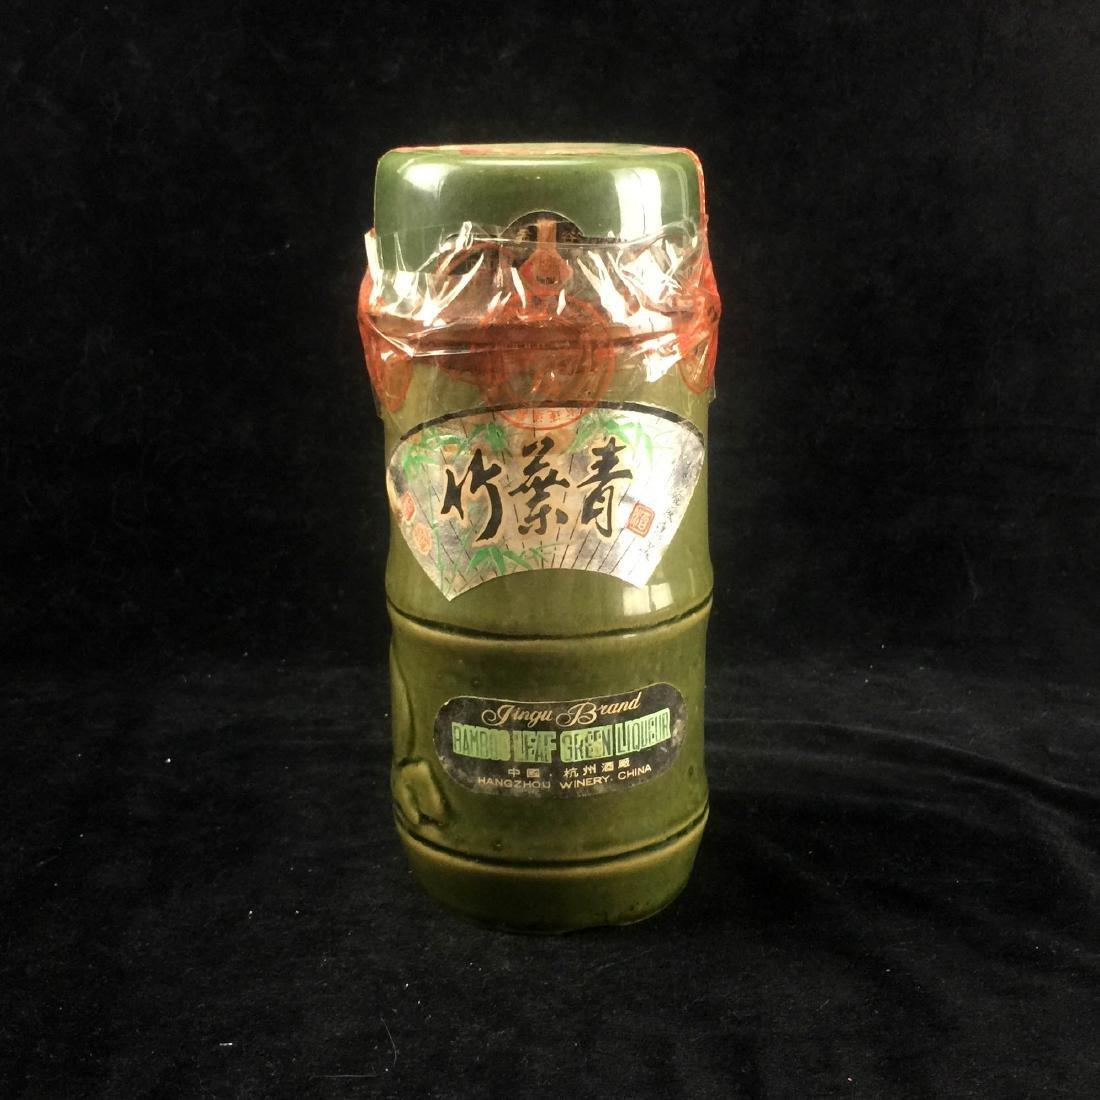 Three Old Chinese Liquor: Celebratory Liquor and Bamboo - 4